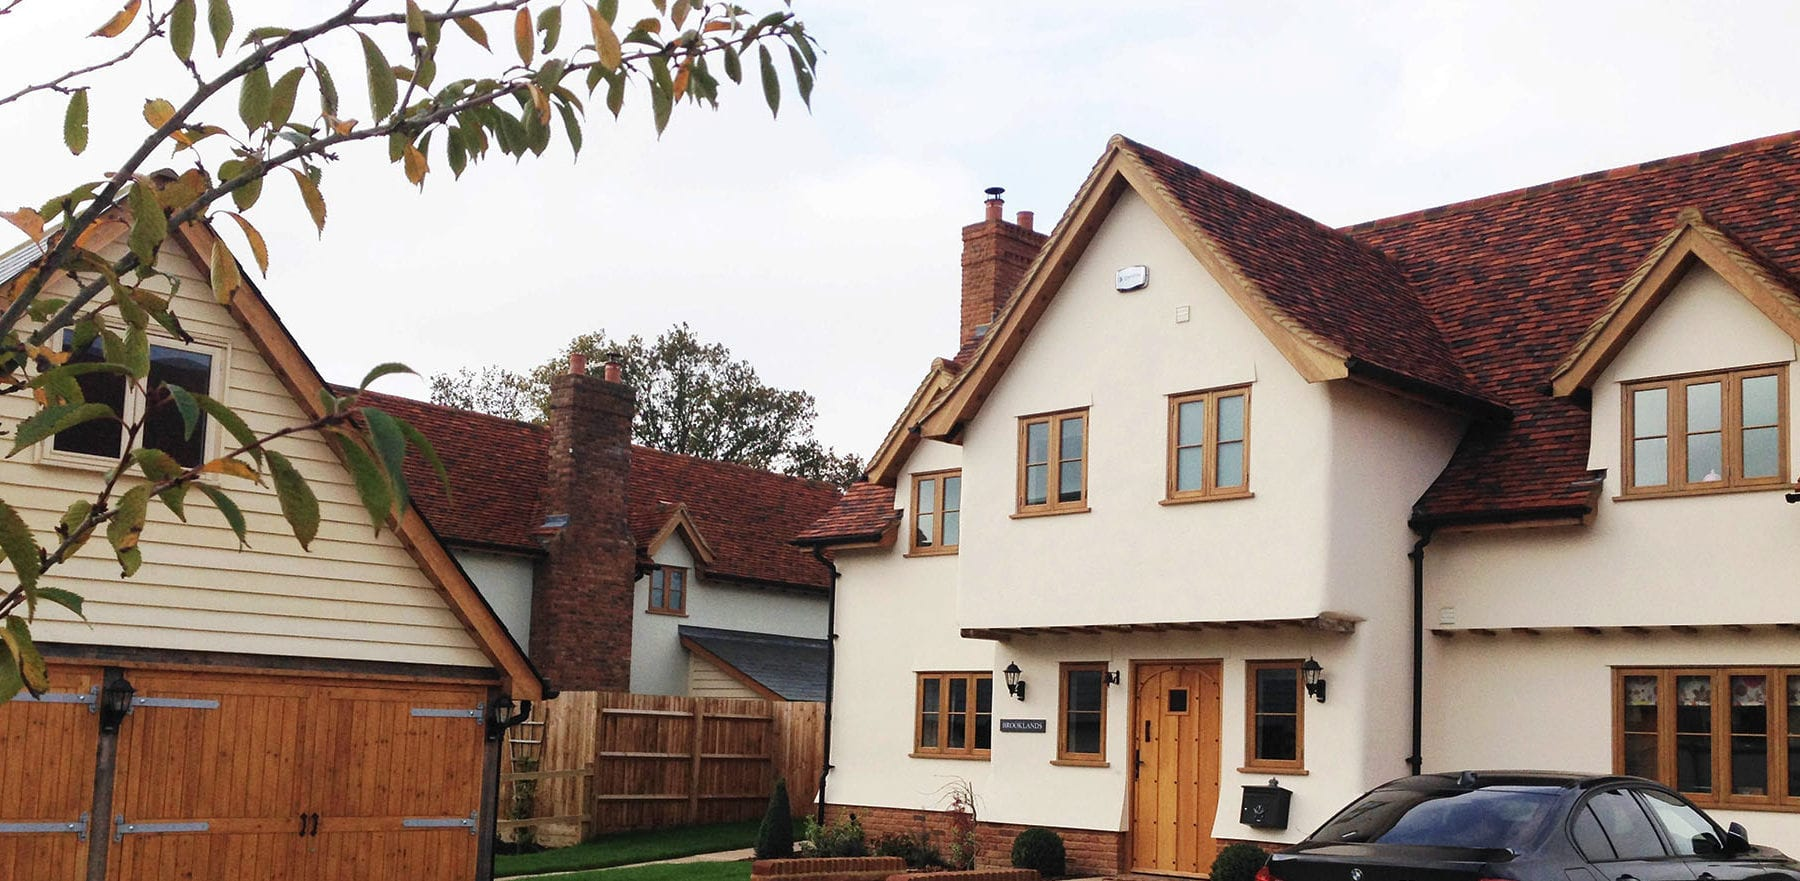 Lifestiles - Handmade Multi Clay Roof Tiles - Manuden, England 2